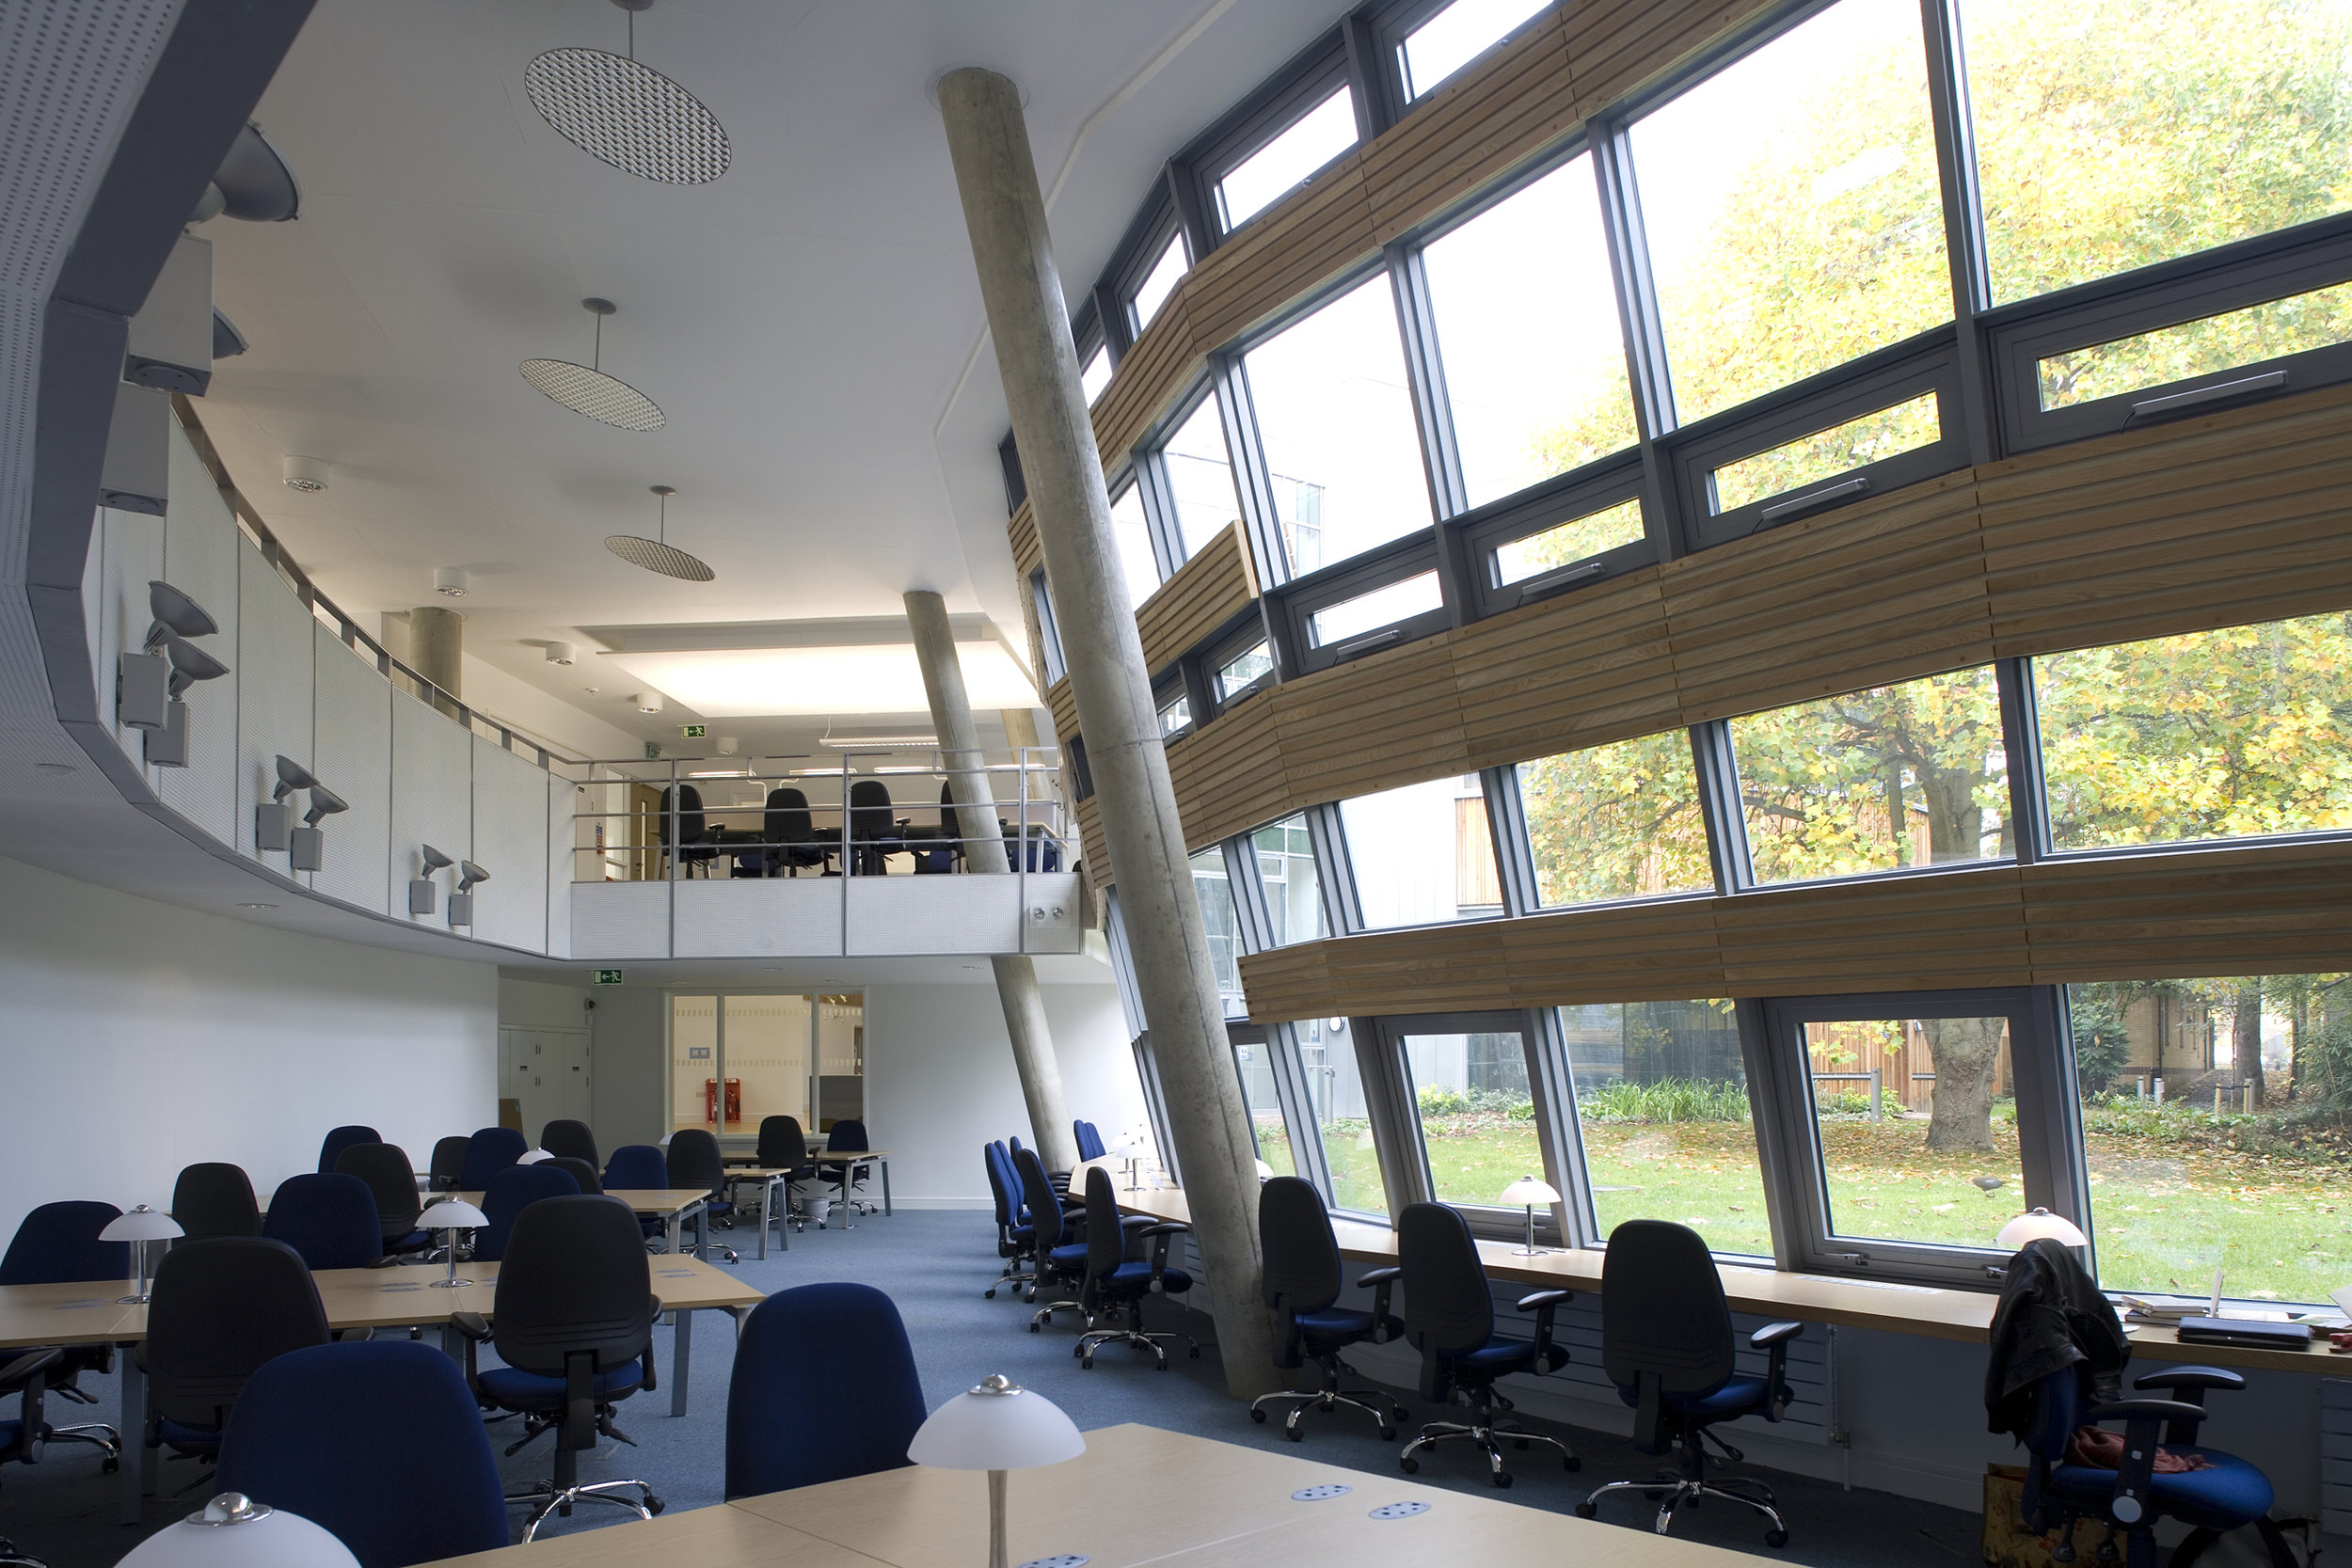 Stephen-Hill-Architects-Berrick-Saul-Building-York-08